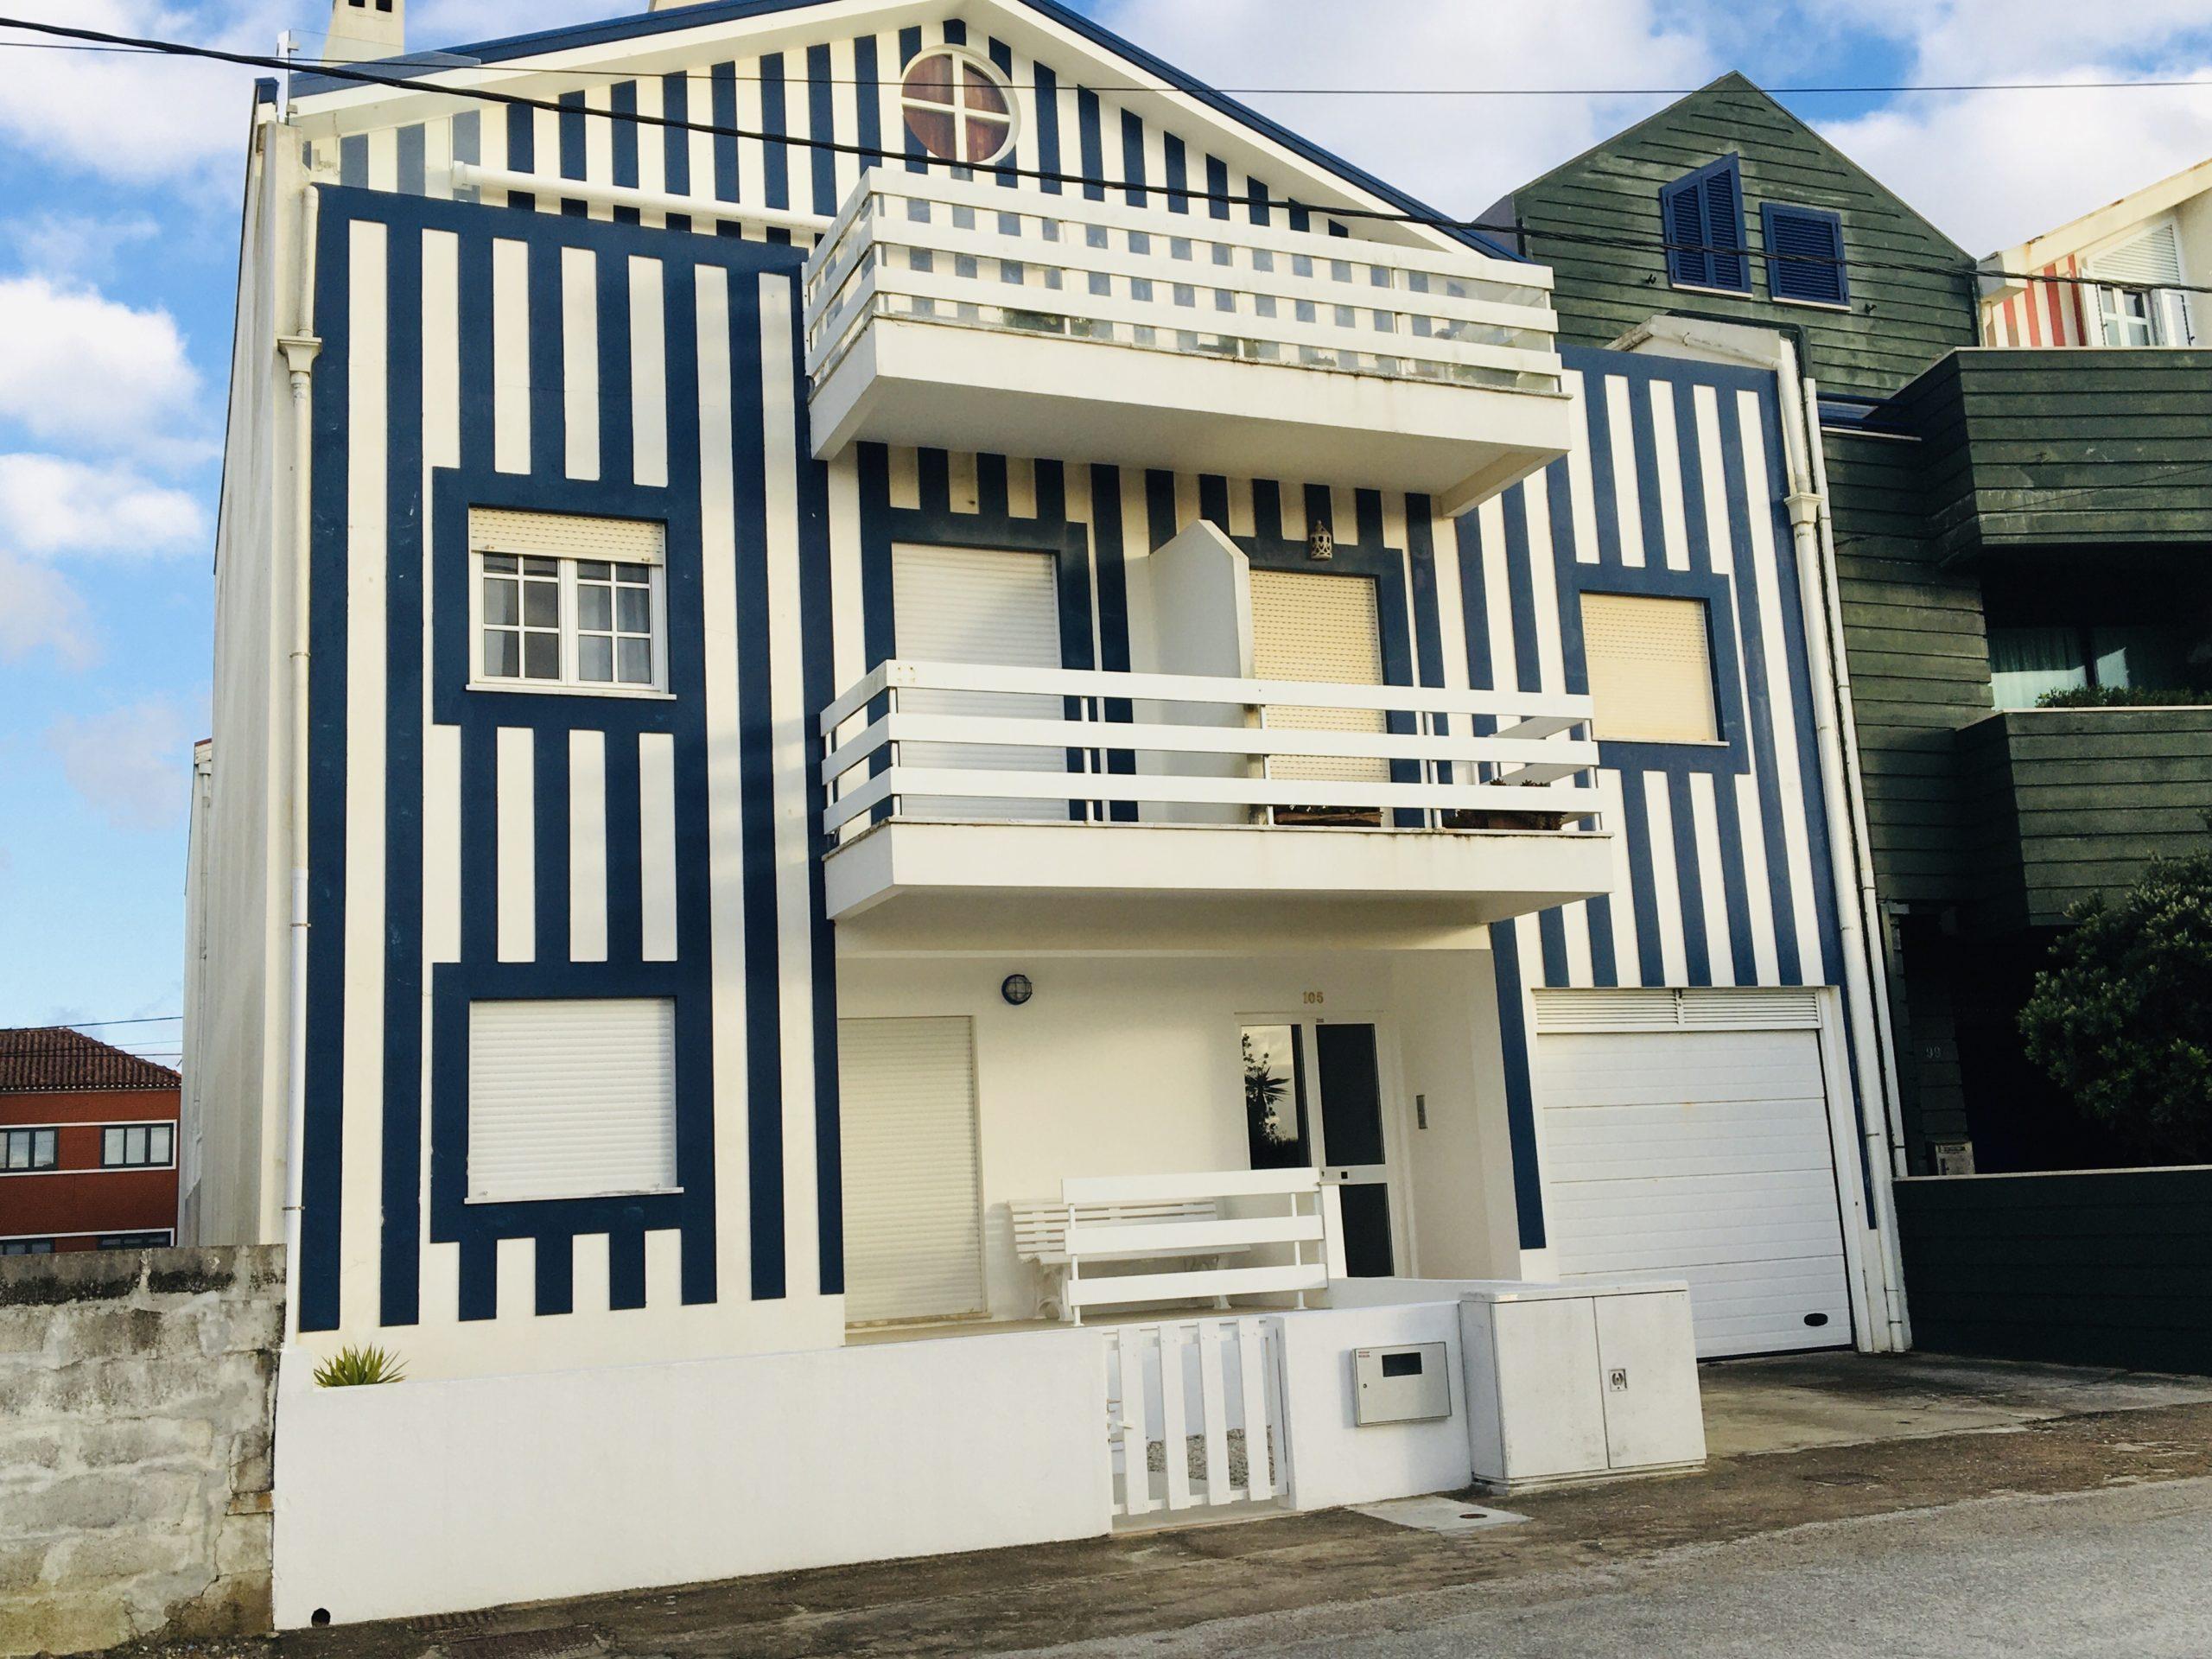 maison rayée costa nova